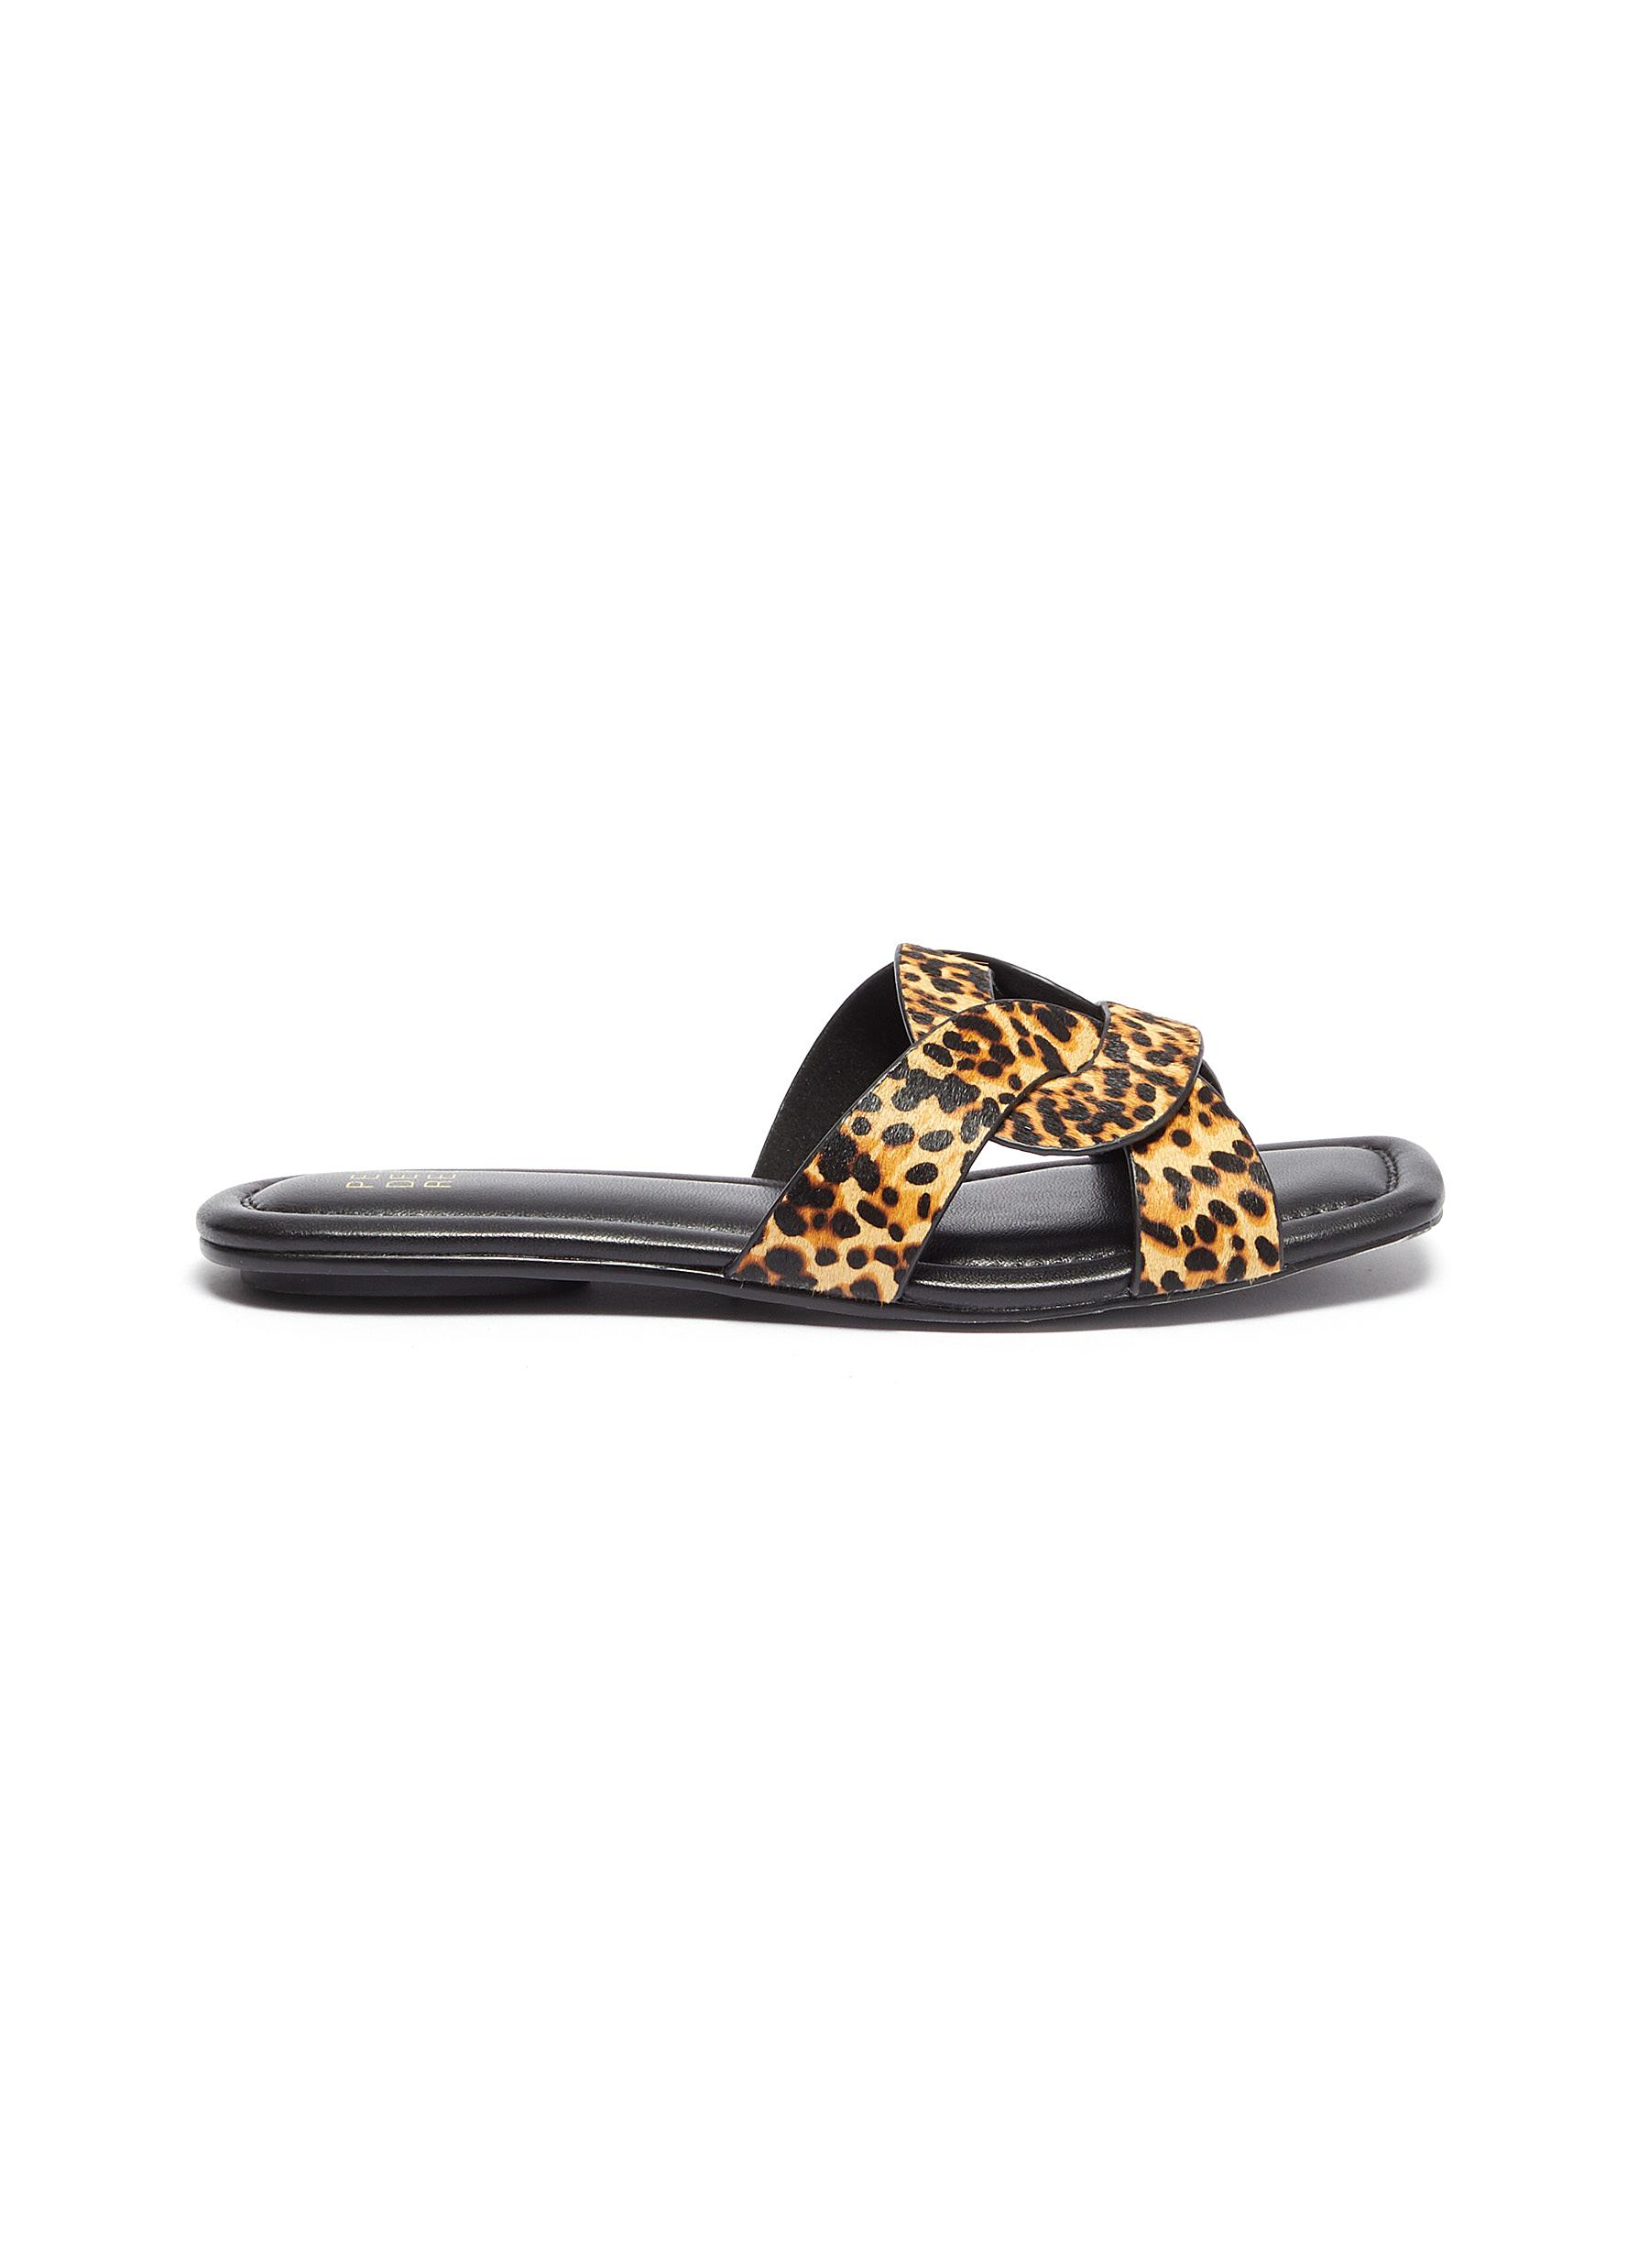 Cameron loop leopard print pony hair slide sandals by Pedder Red